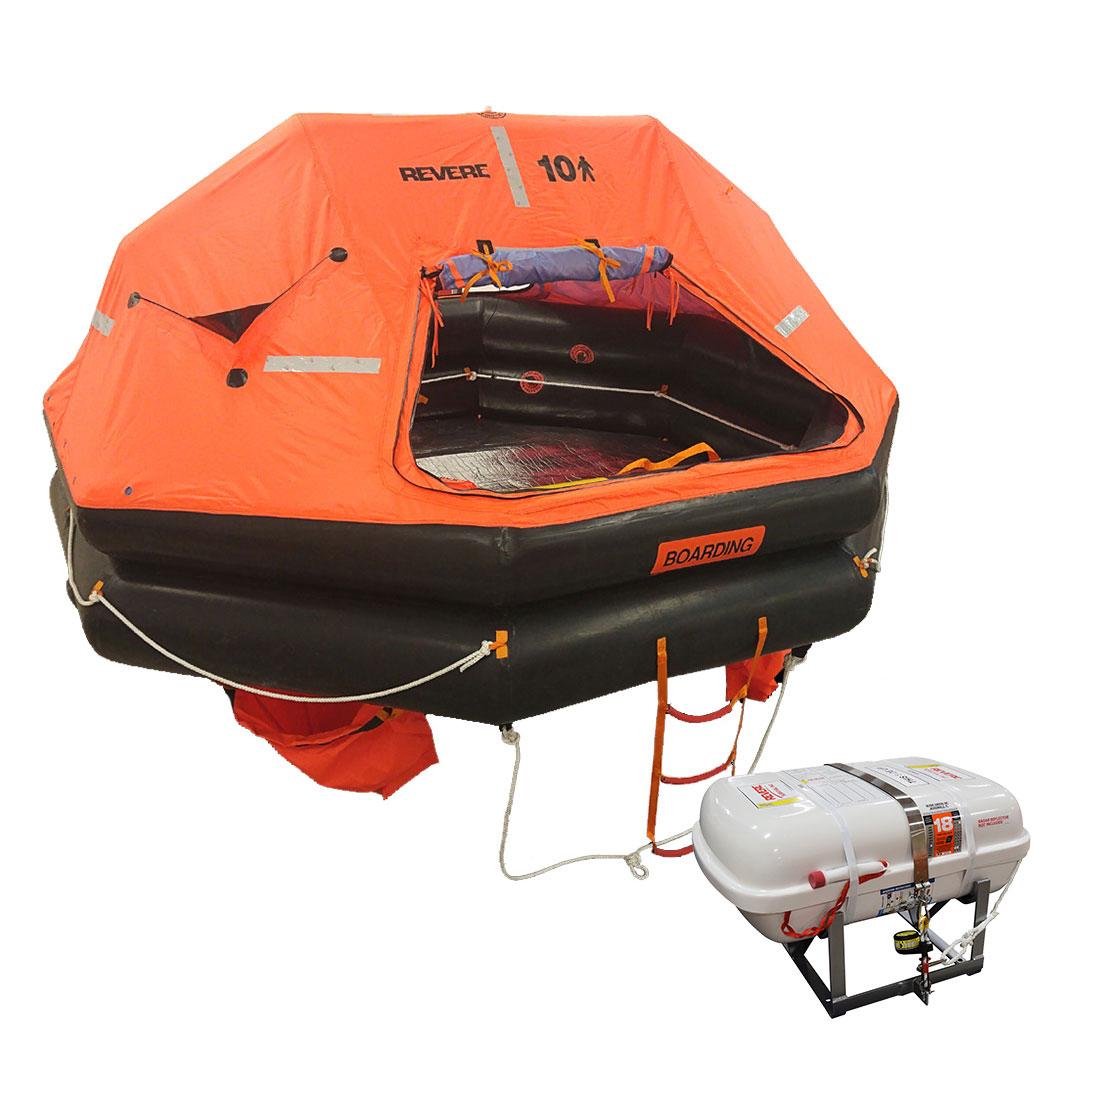 Revere Life Raft USCG/SOLAS 8 Person - Low-Profile Container